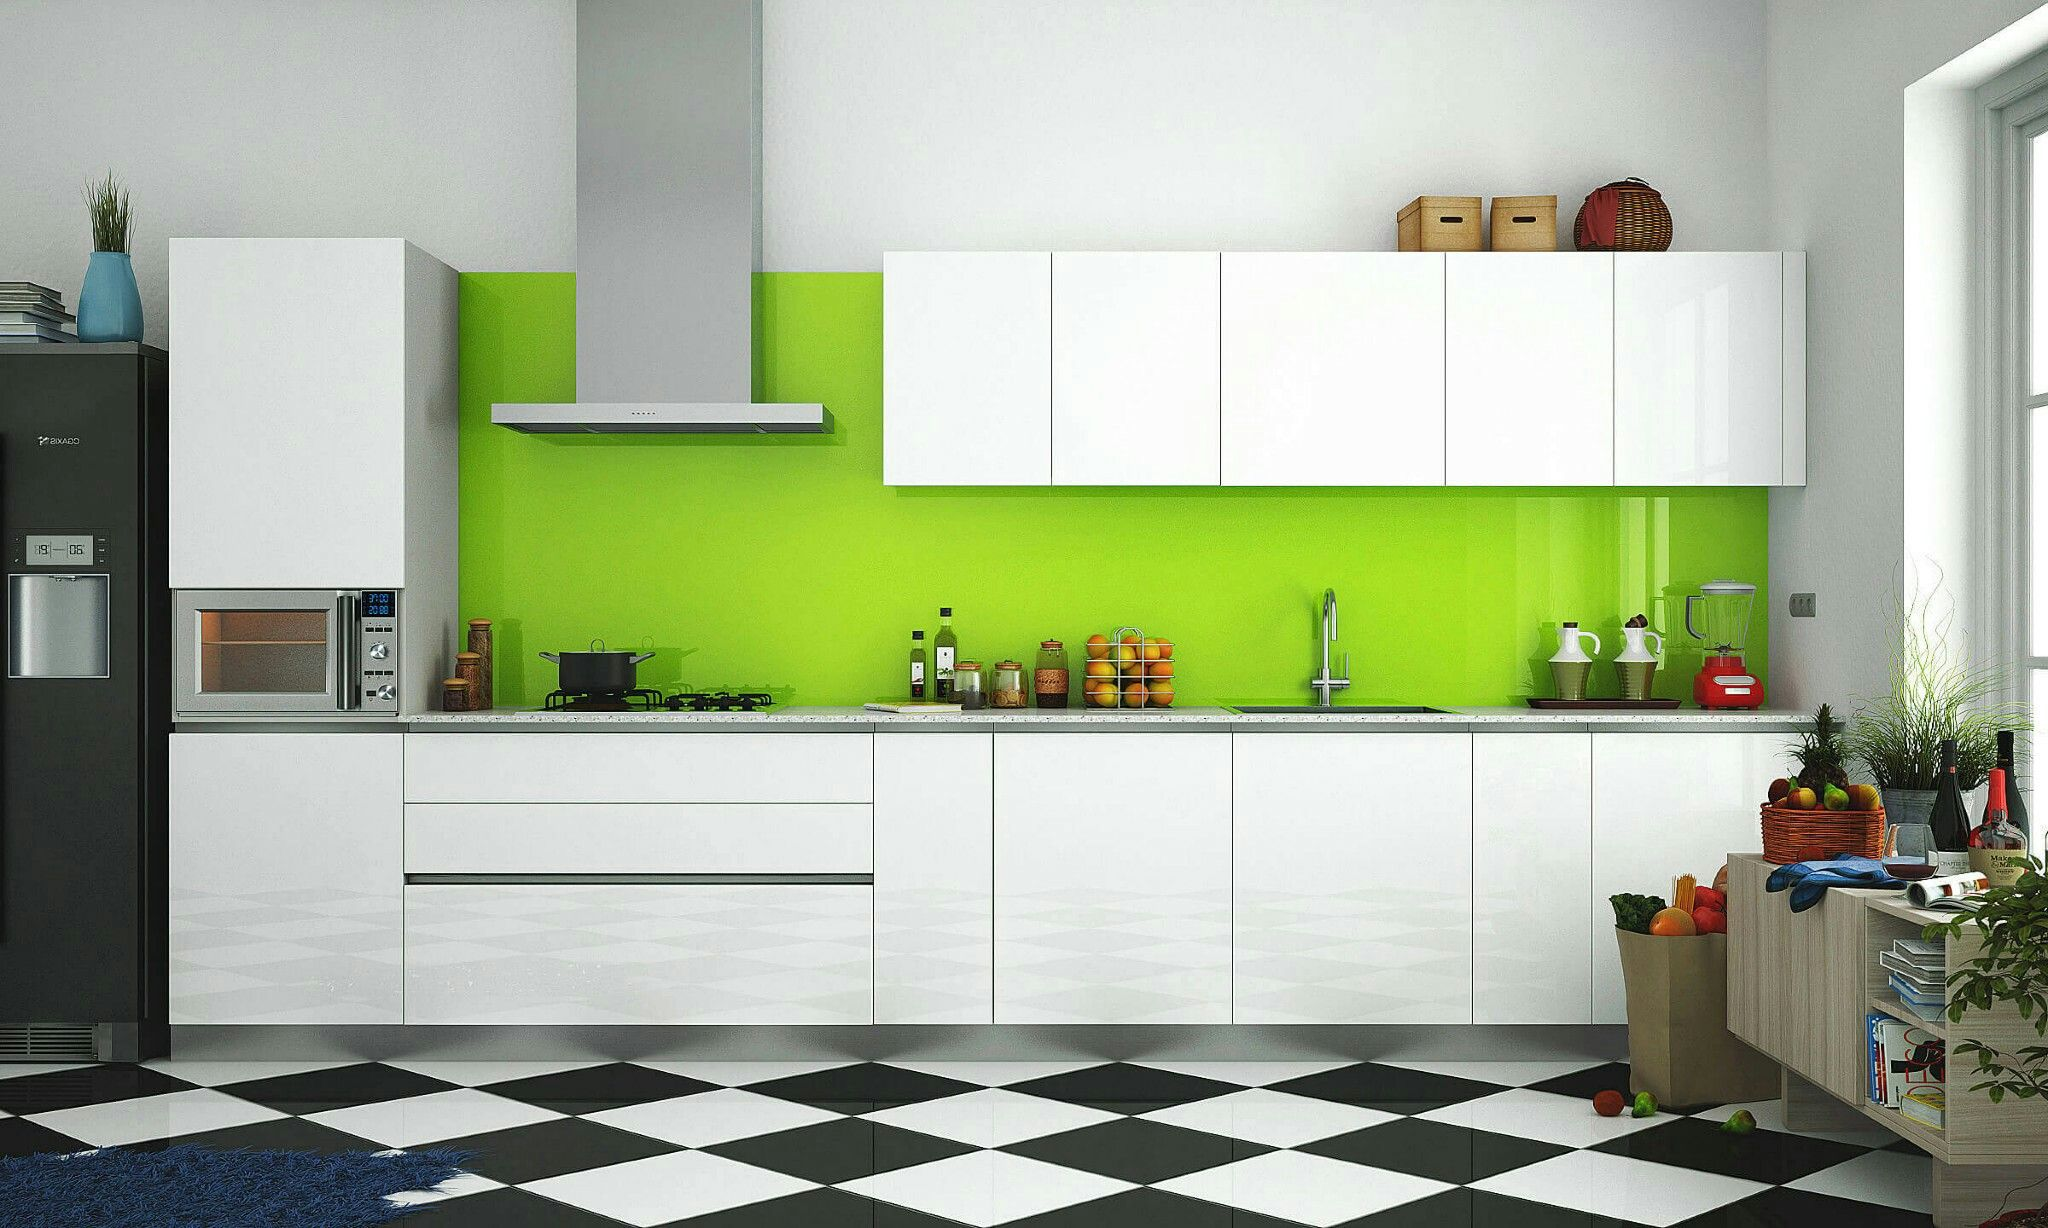 parallel kitchen design india - Google Search | kitchen | Pinterest ...